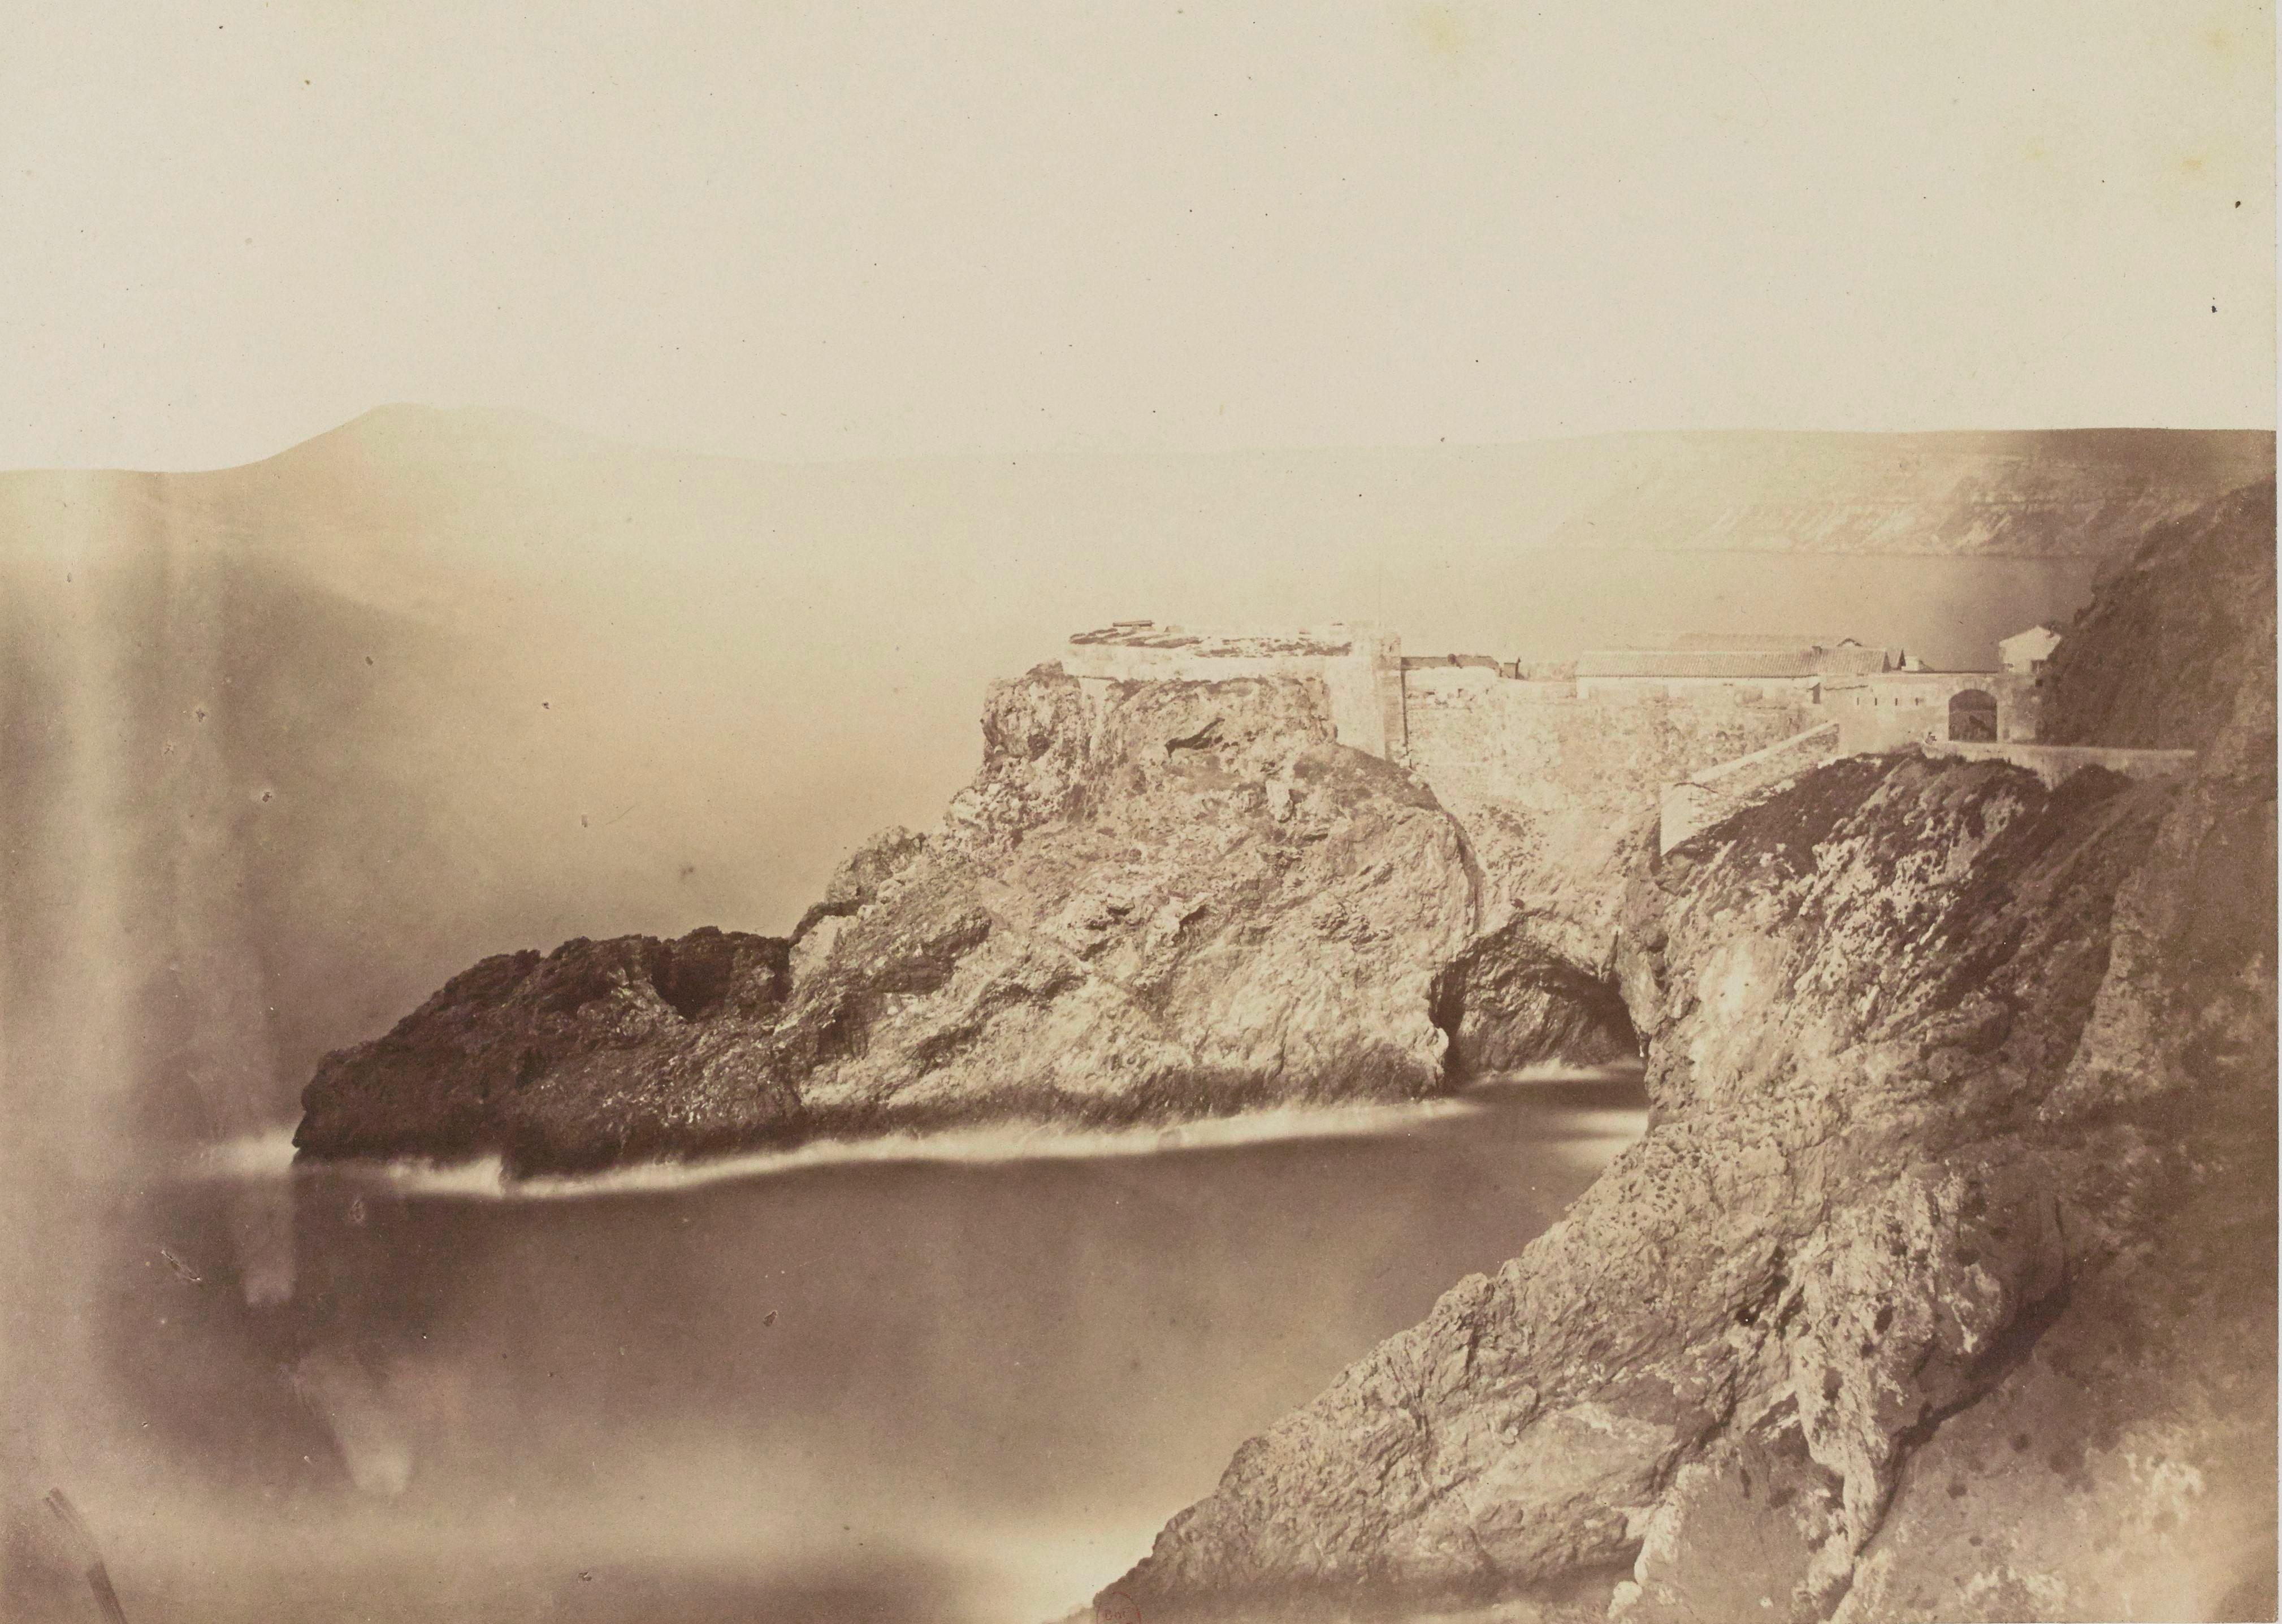 26. Форт Ламун и въезд в Оран, по дороге Мерц-эль-Кебир